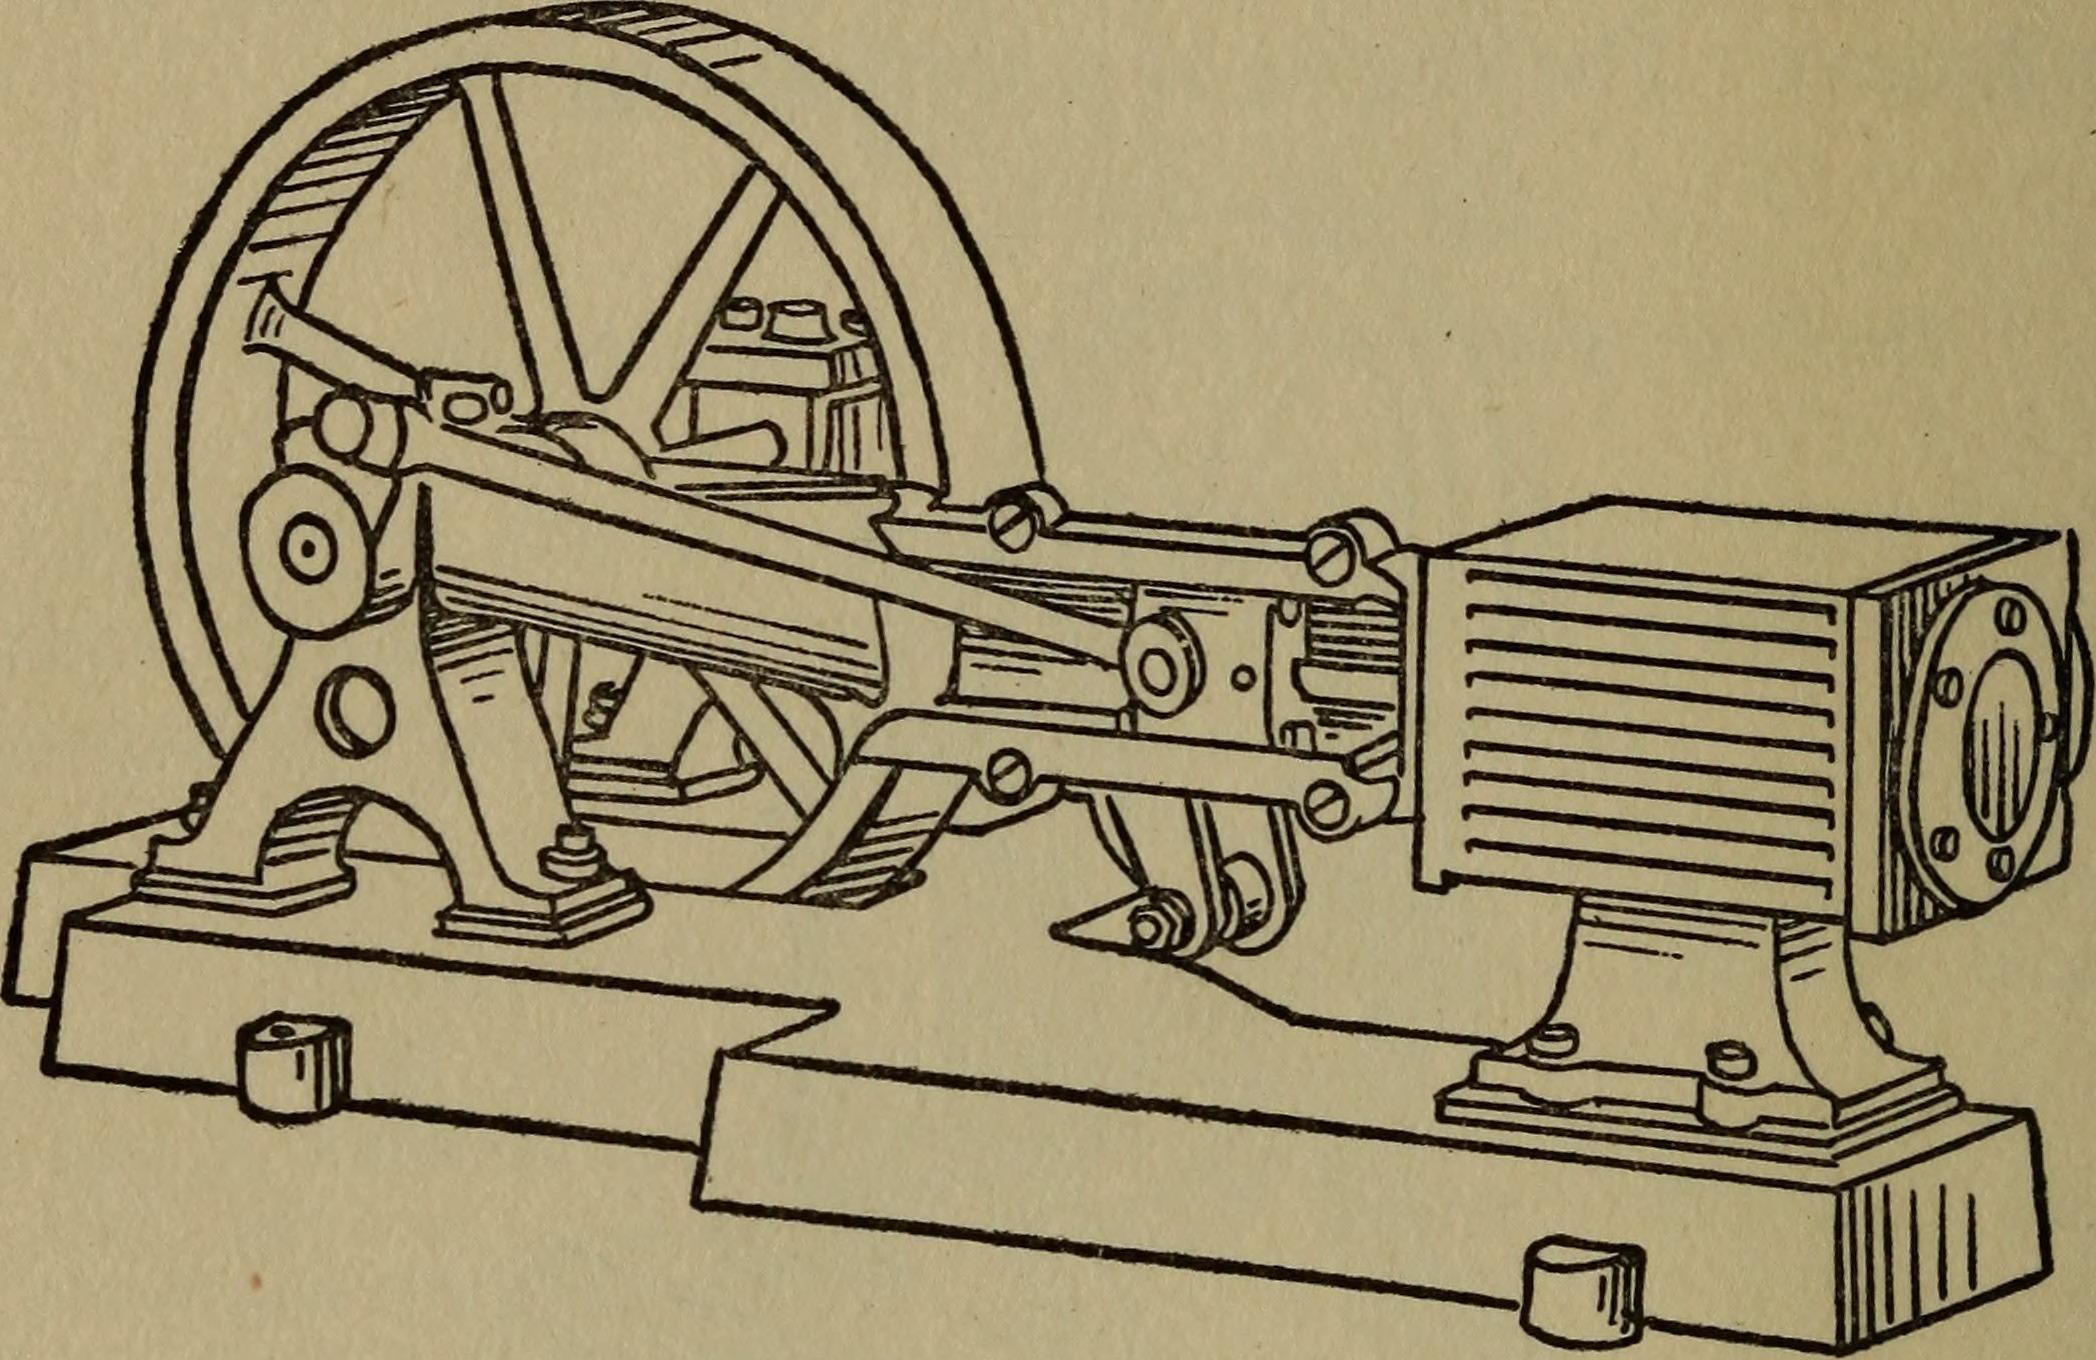 2096x1360 Filecollins Steam Engine Drawing.jpg